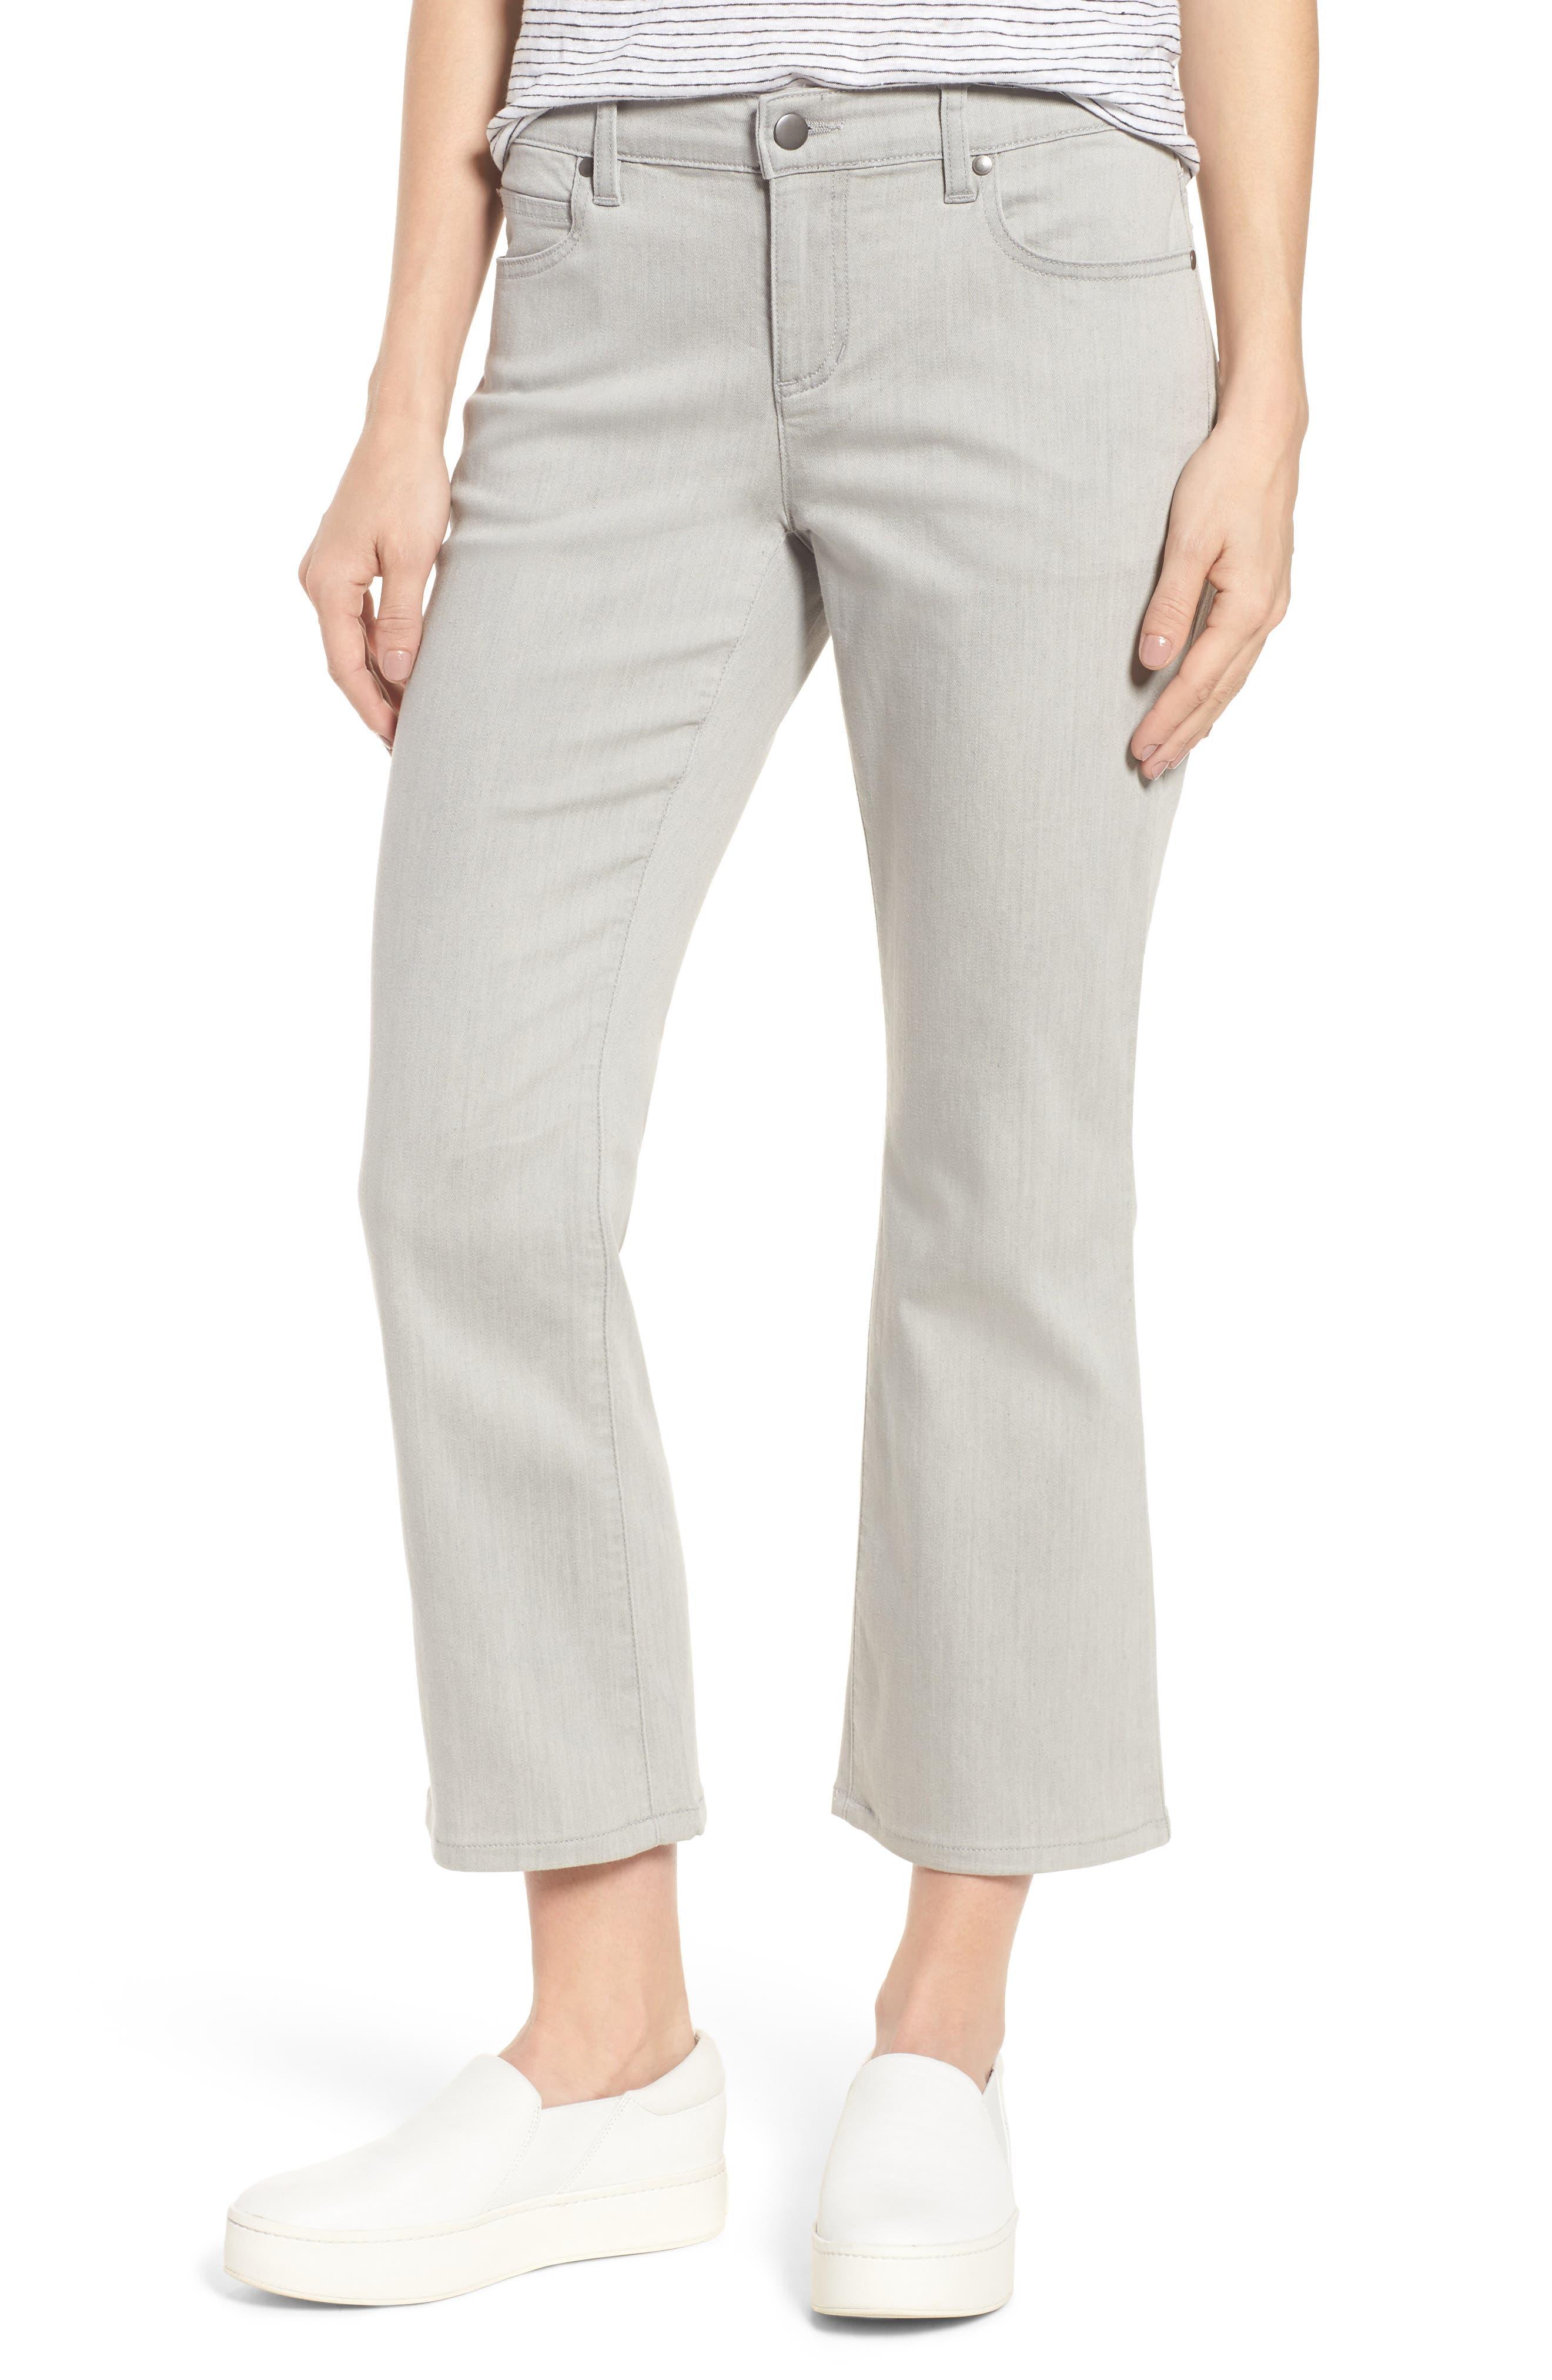 Organic Cotton Blend Crop Flare Jeans,                             Main thumbnail 1, color,                             Sun Bleached Gray